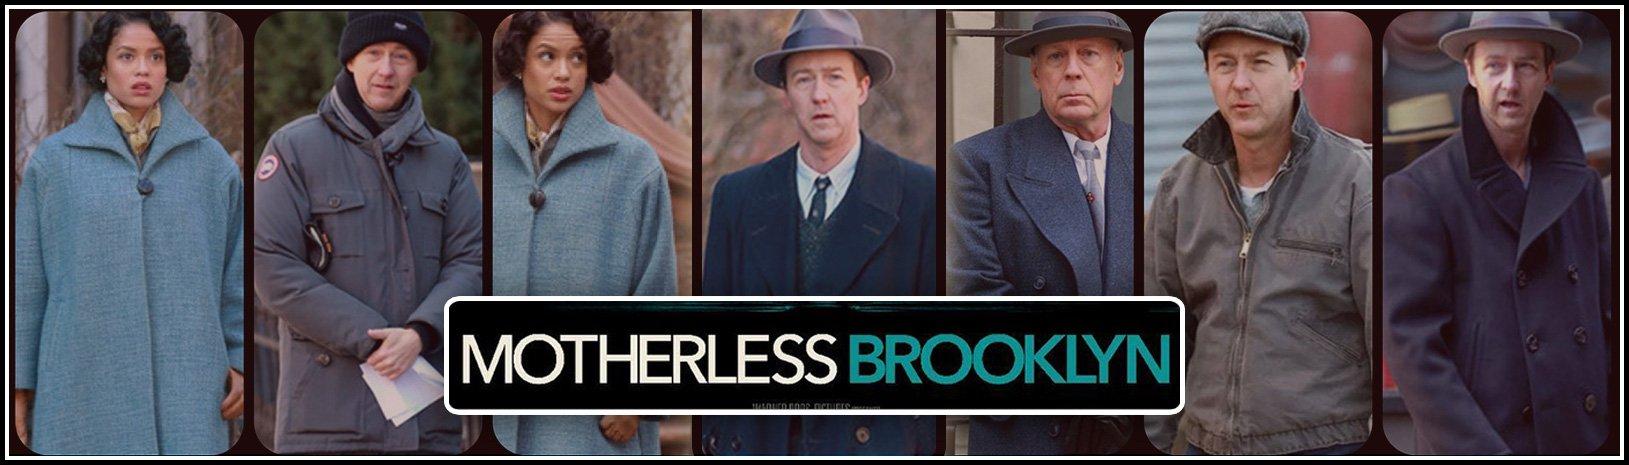 Motherless Brooklyn Wool Coat